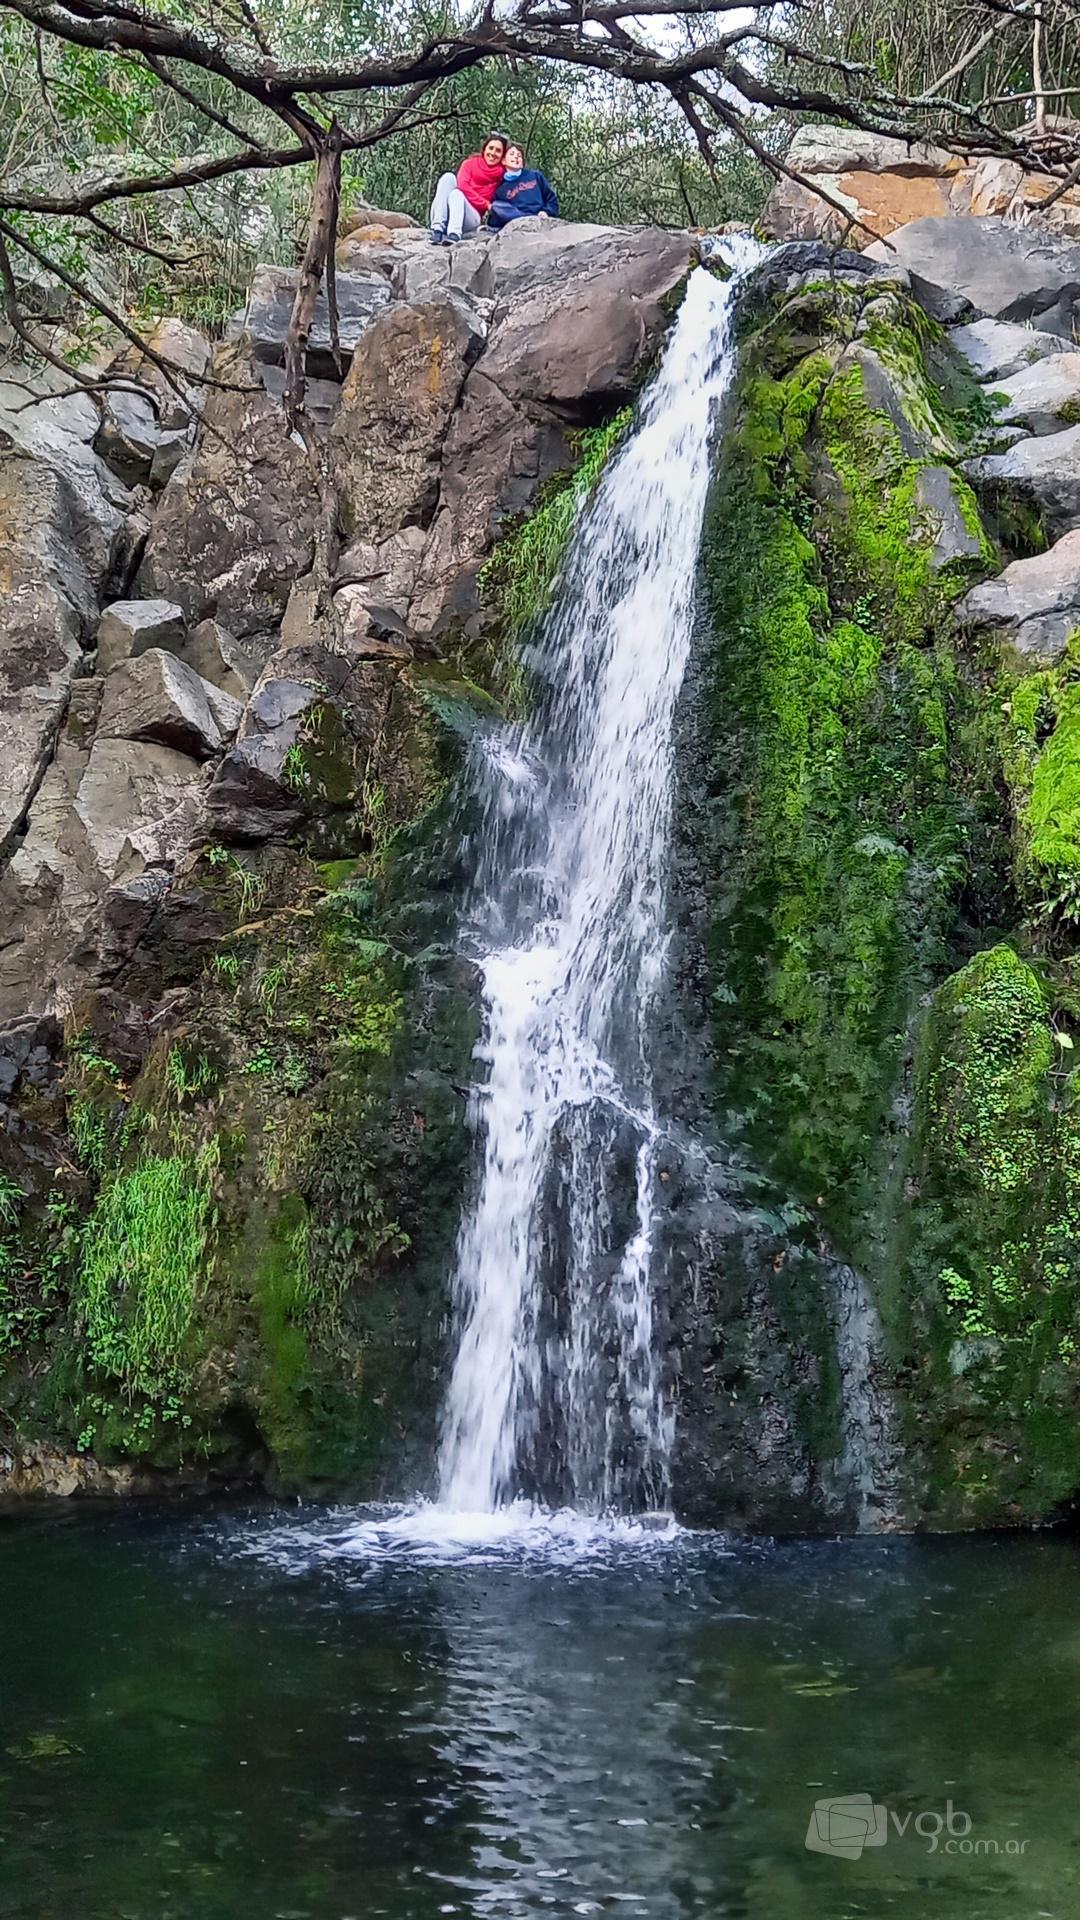 La Cascada - Santa Rosa de Calamuchita - Turismo en Villa General Belgrano 2